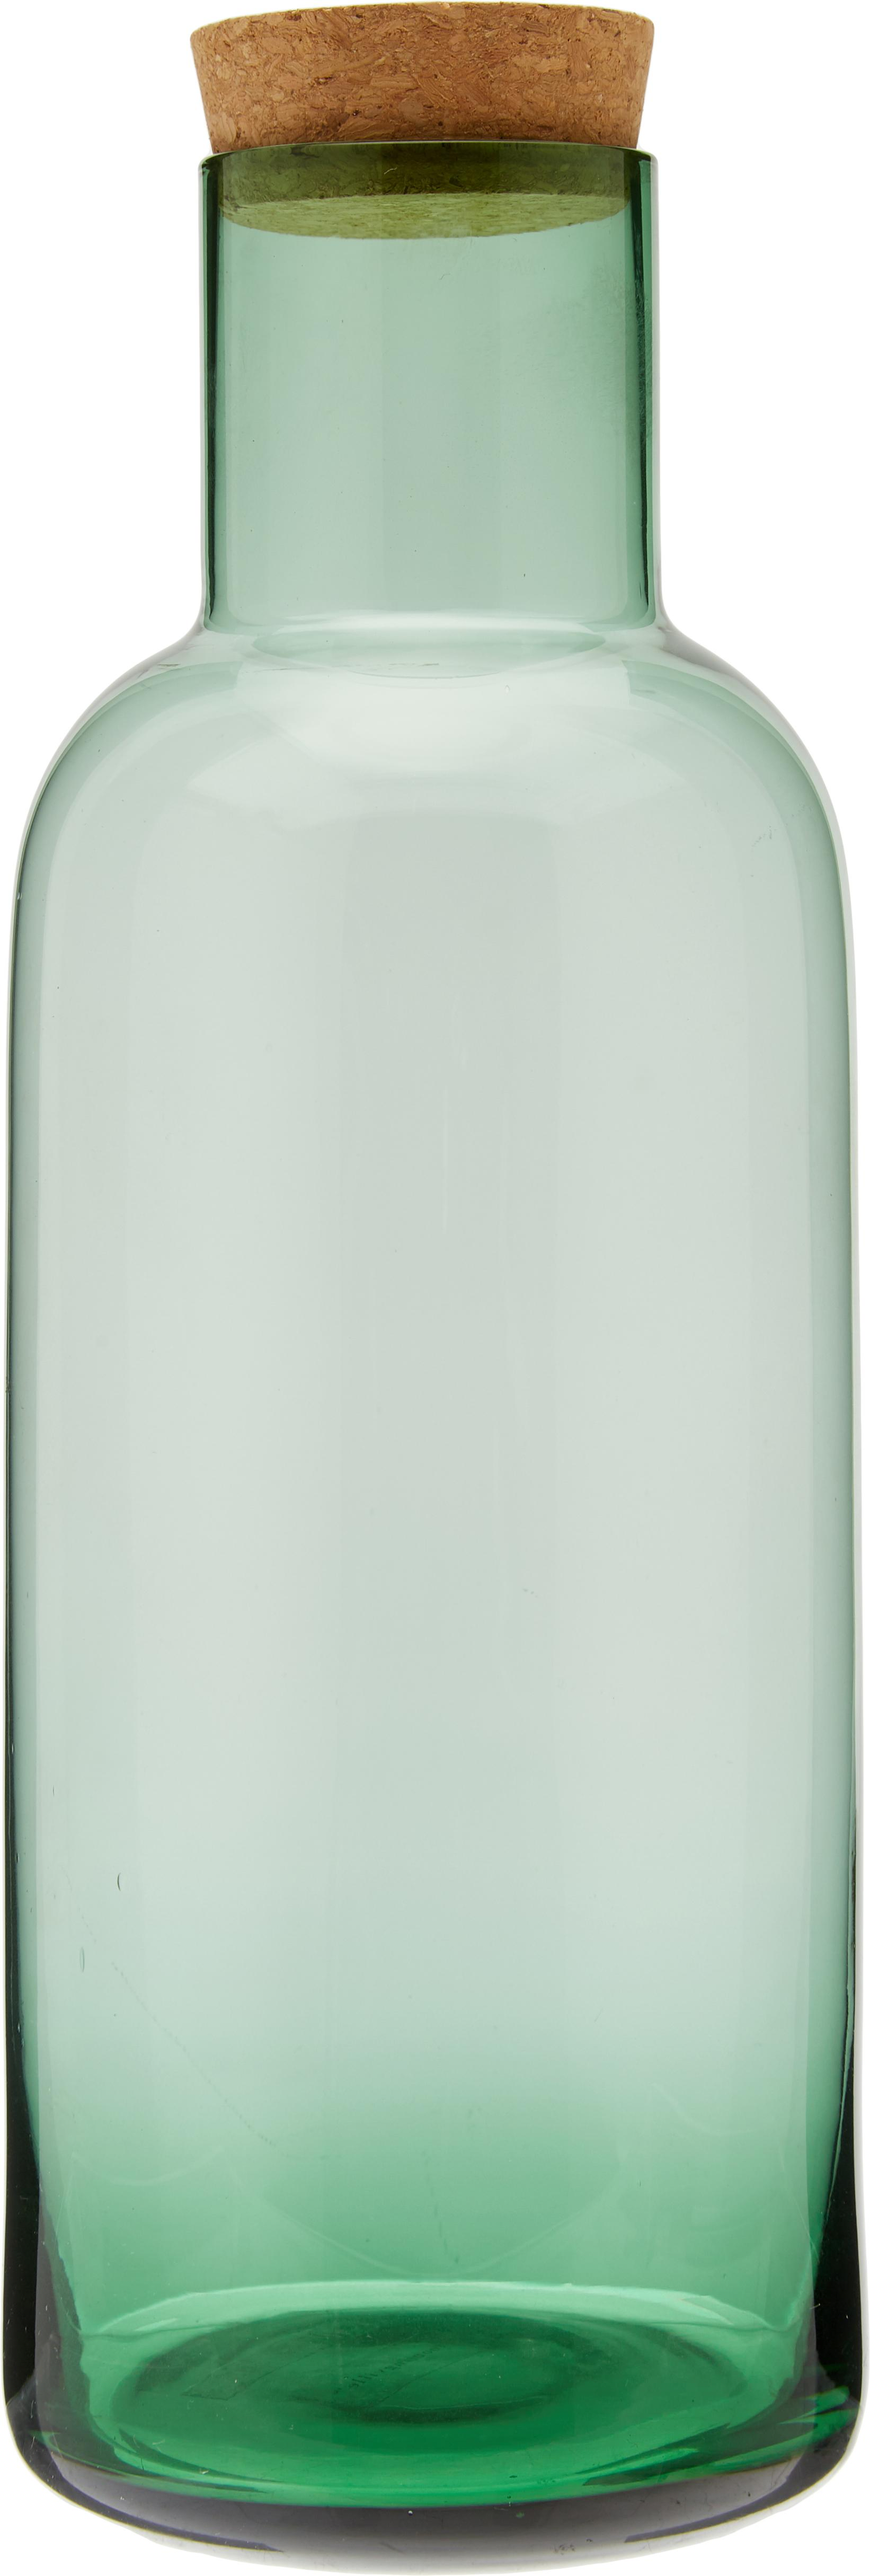 Karaffe Clearance in Grün transparent, Deckel: Kork, Grün, transparent, 1 L